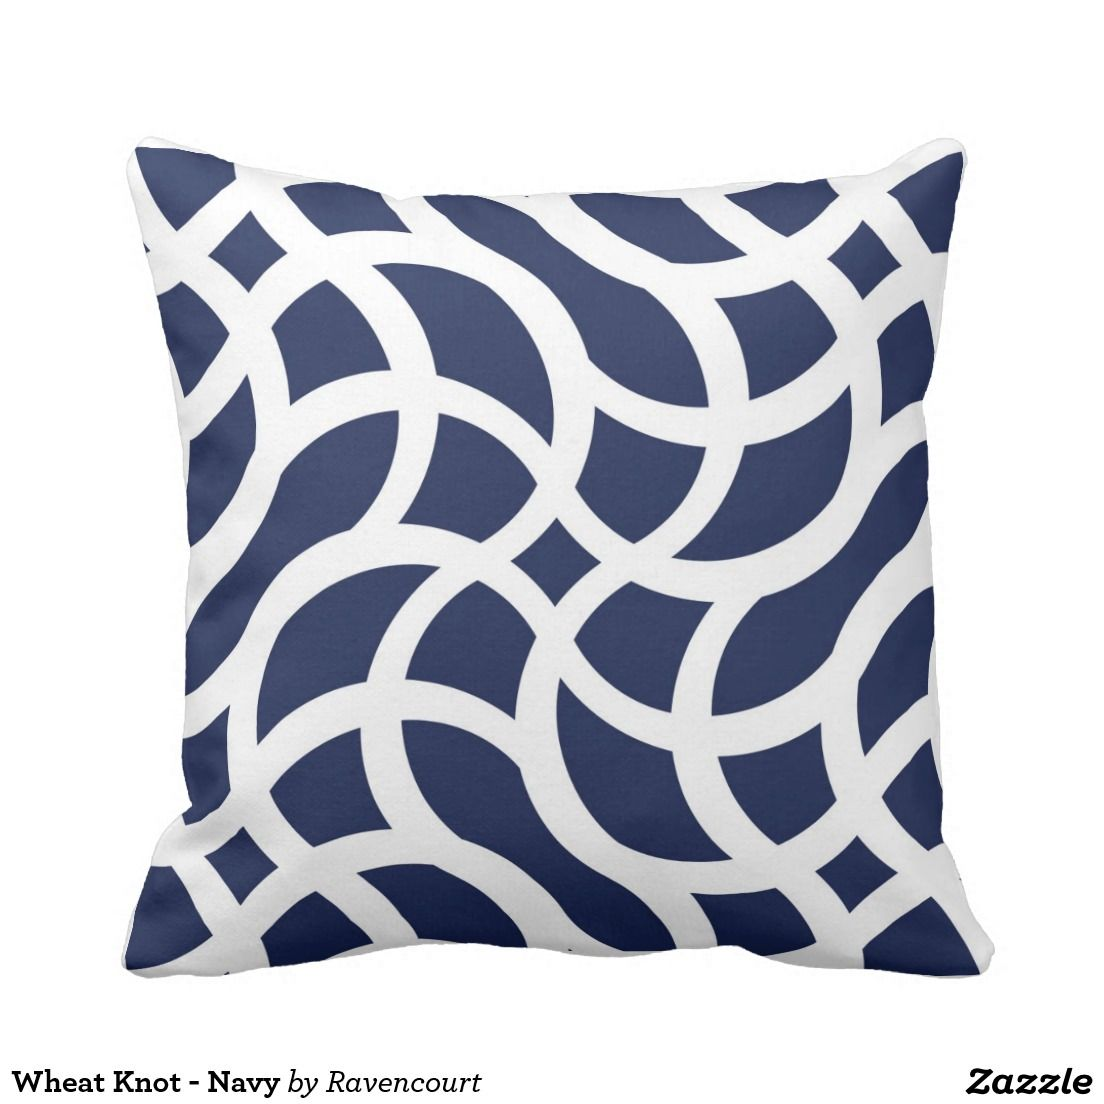 Wheat knot navy throw pillow navy pillows